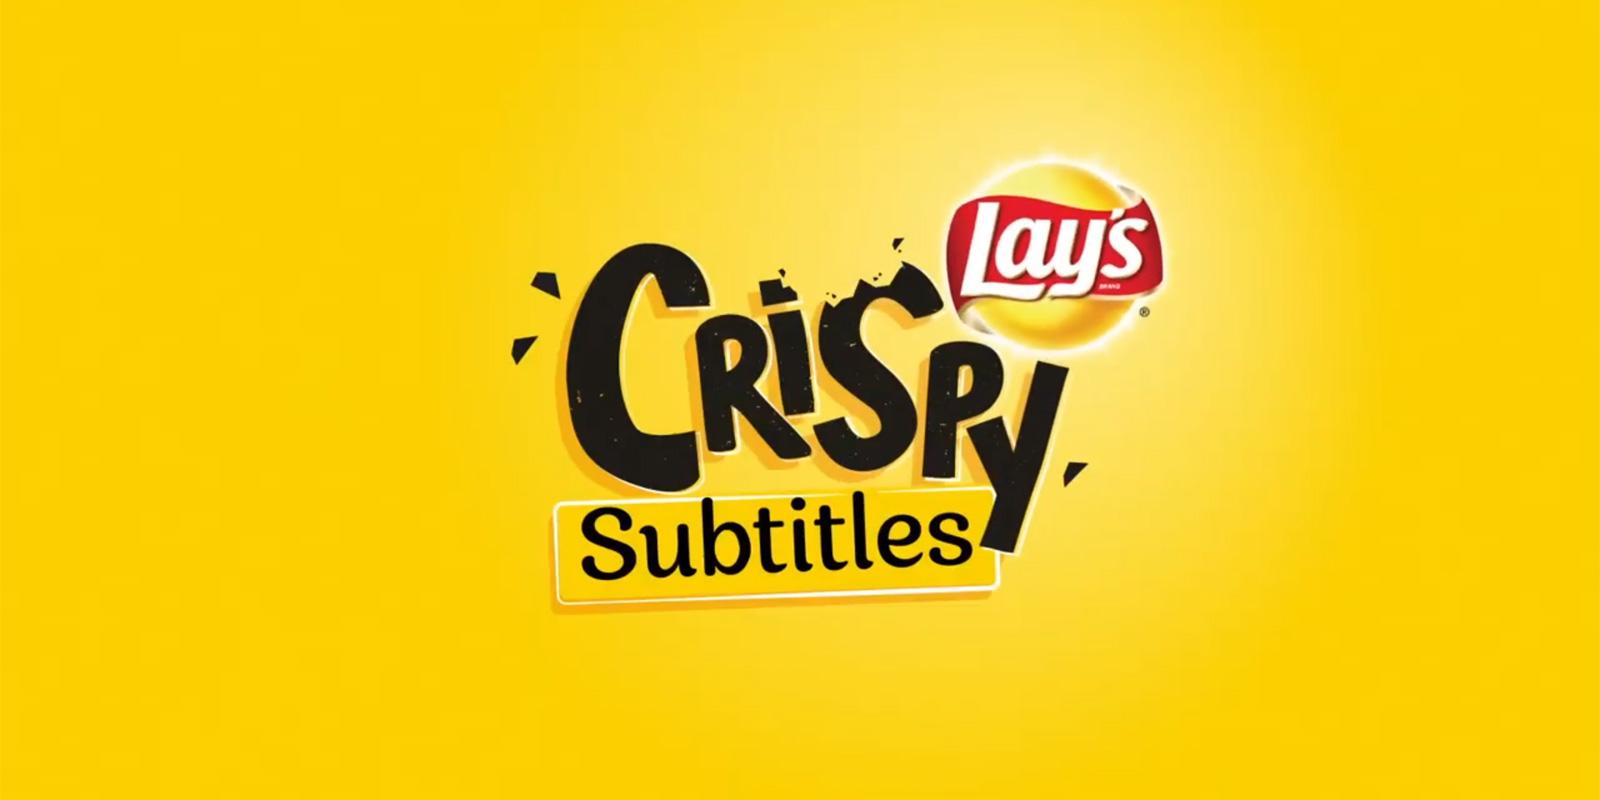 Crispy Subtitles